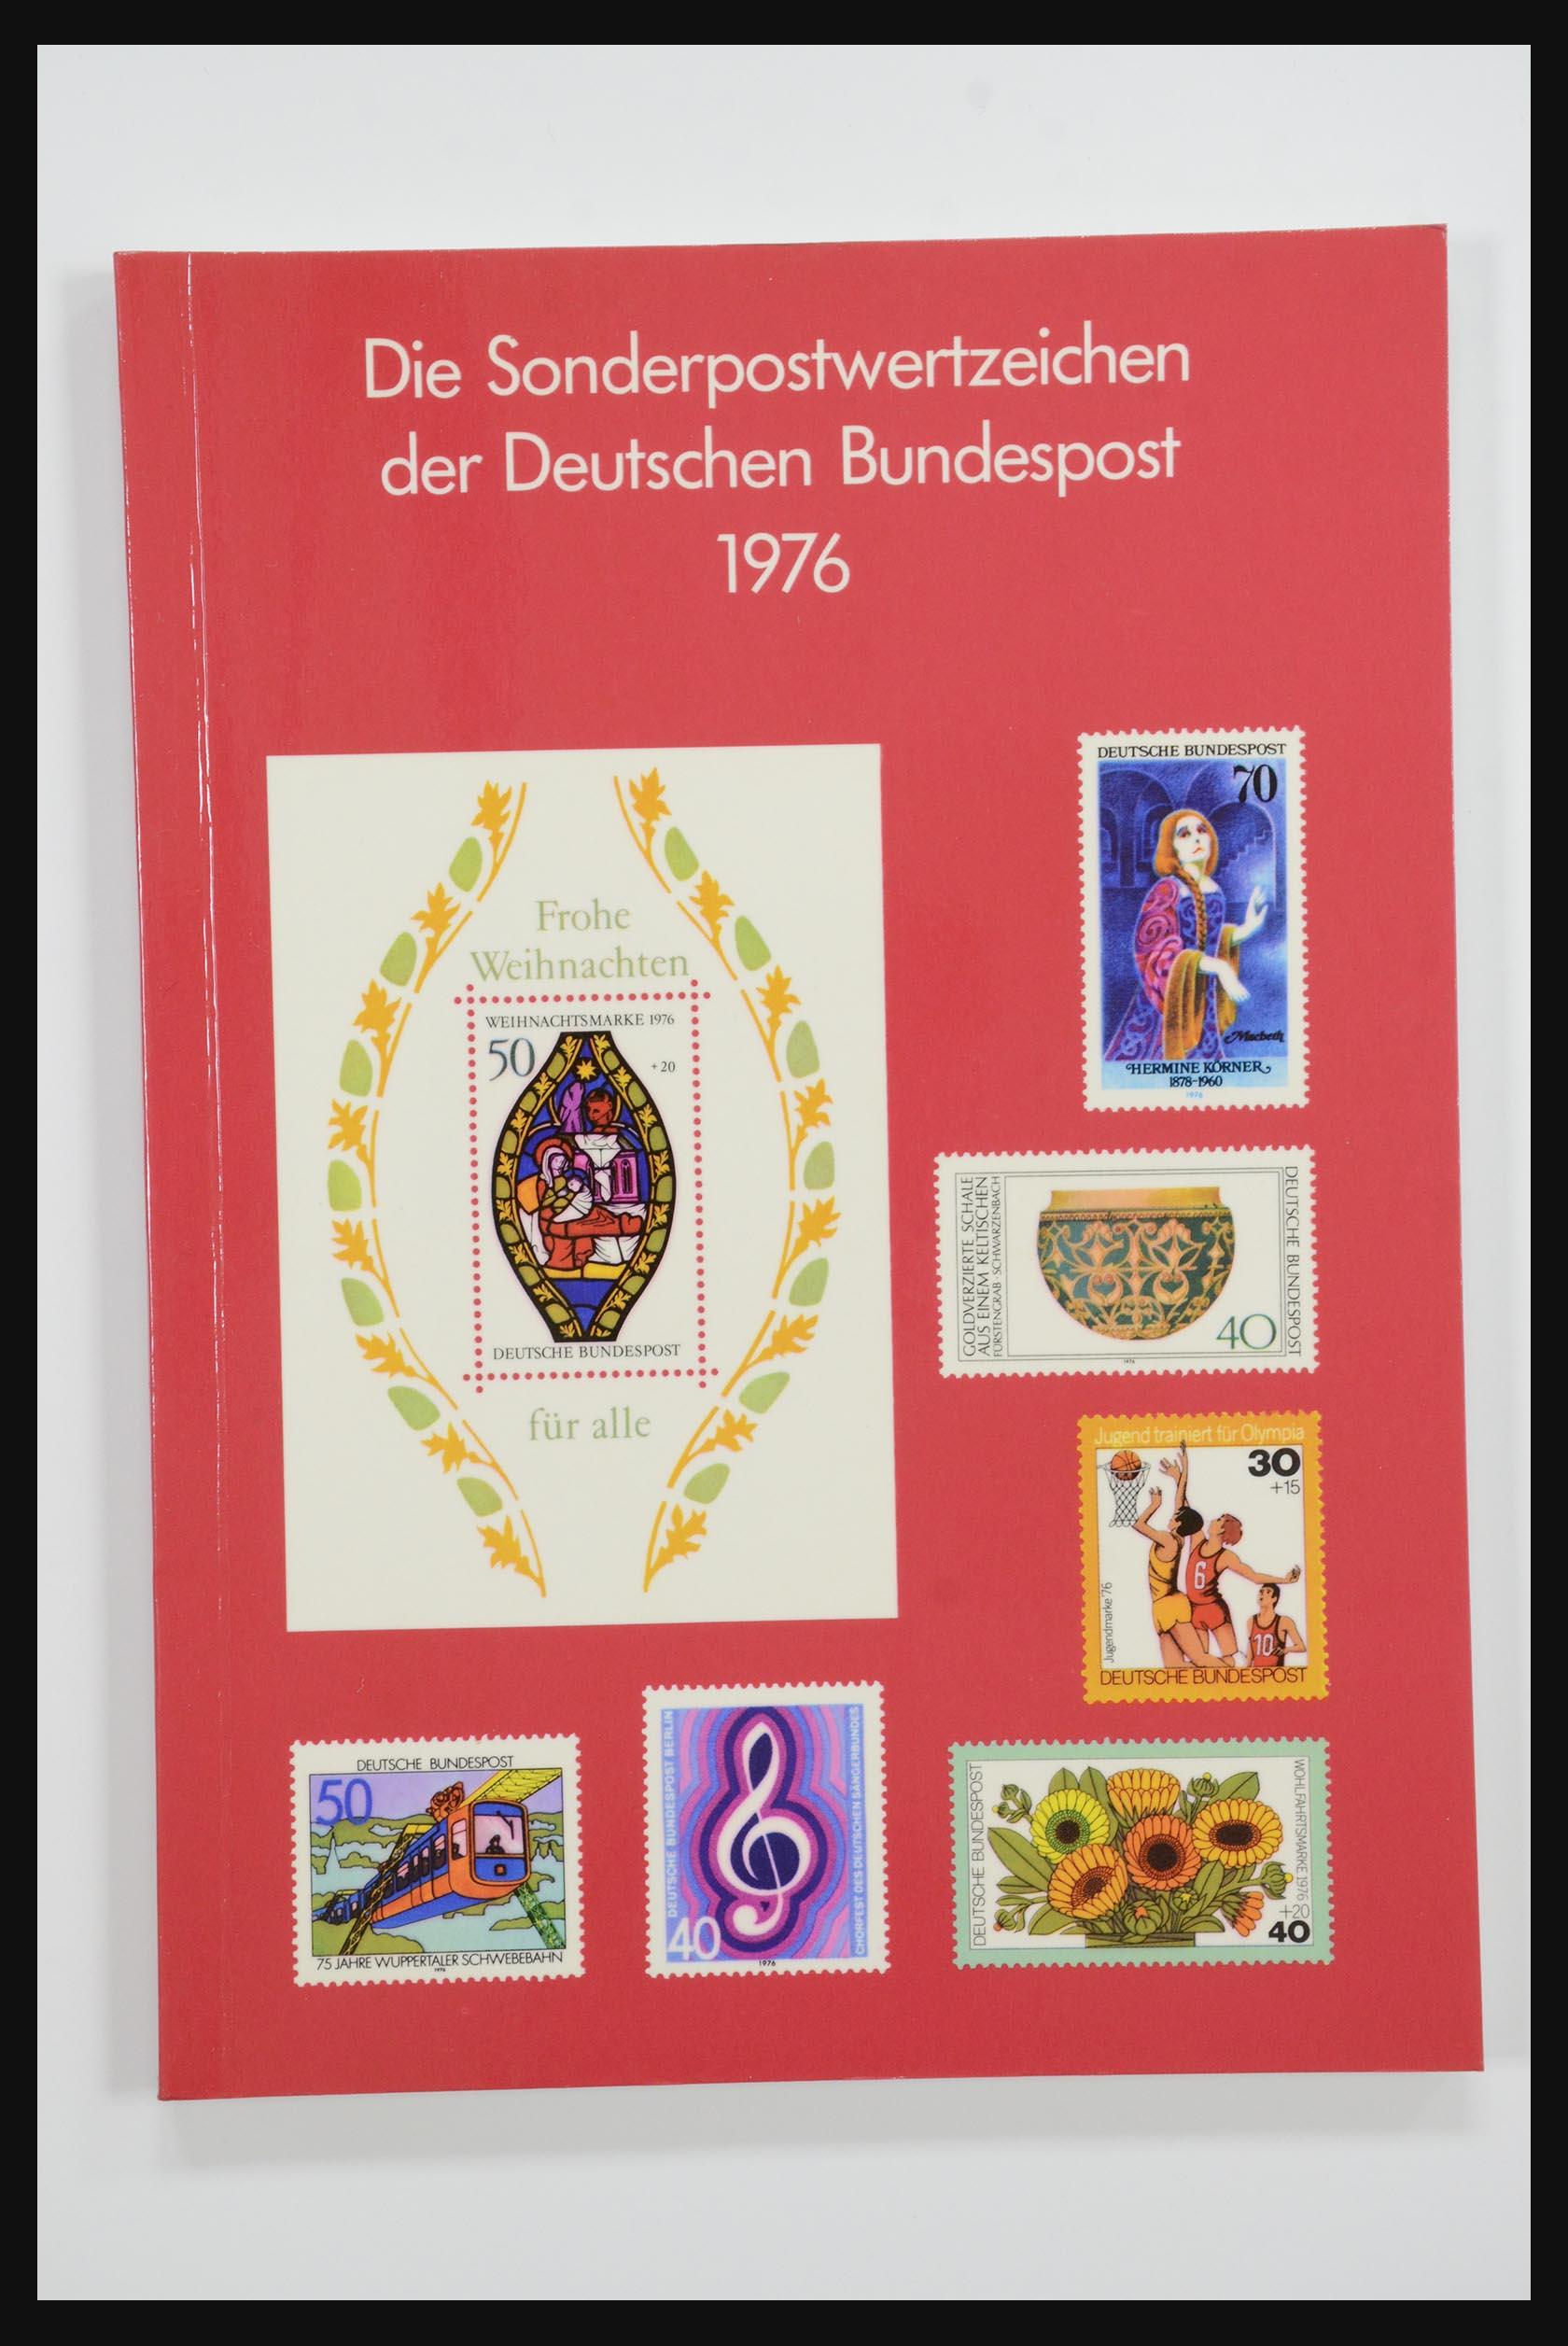 31834 004 - 31834 Bundespost yearbooks 1973(!)-1999.